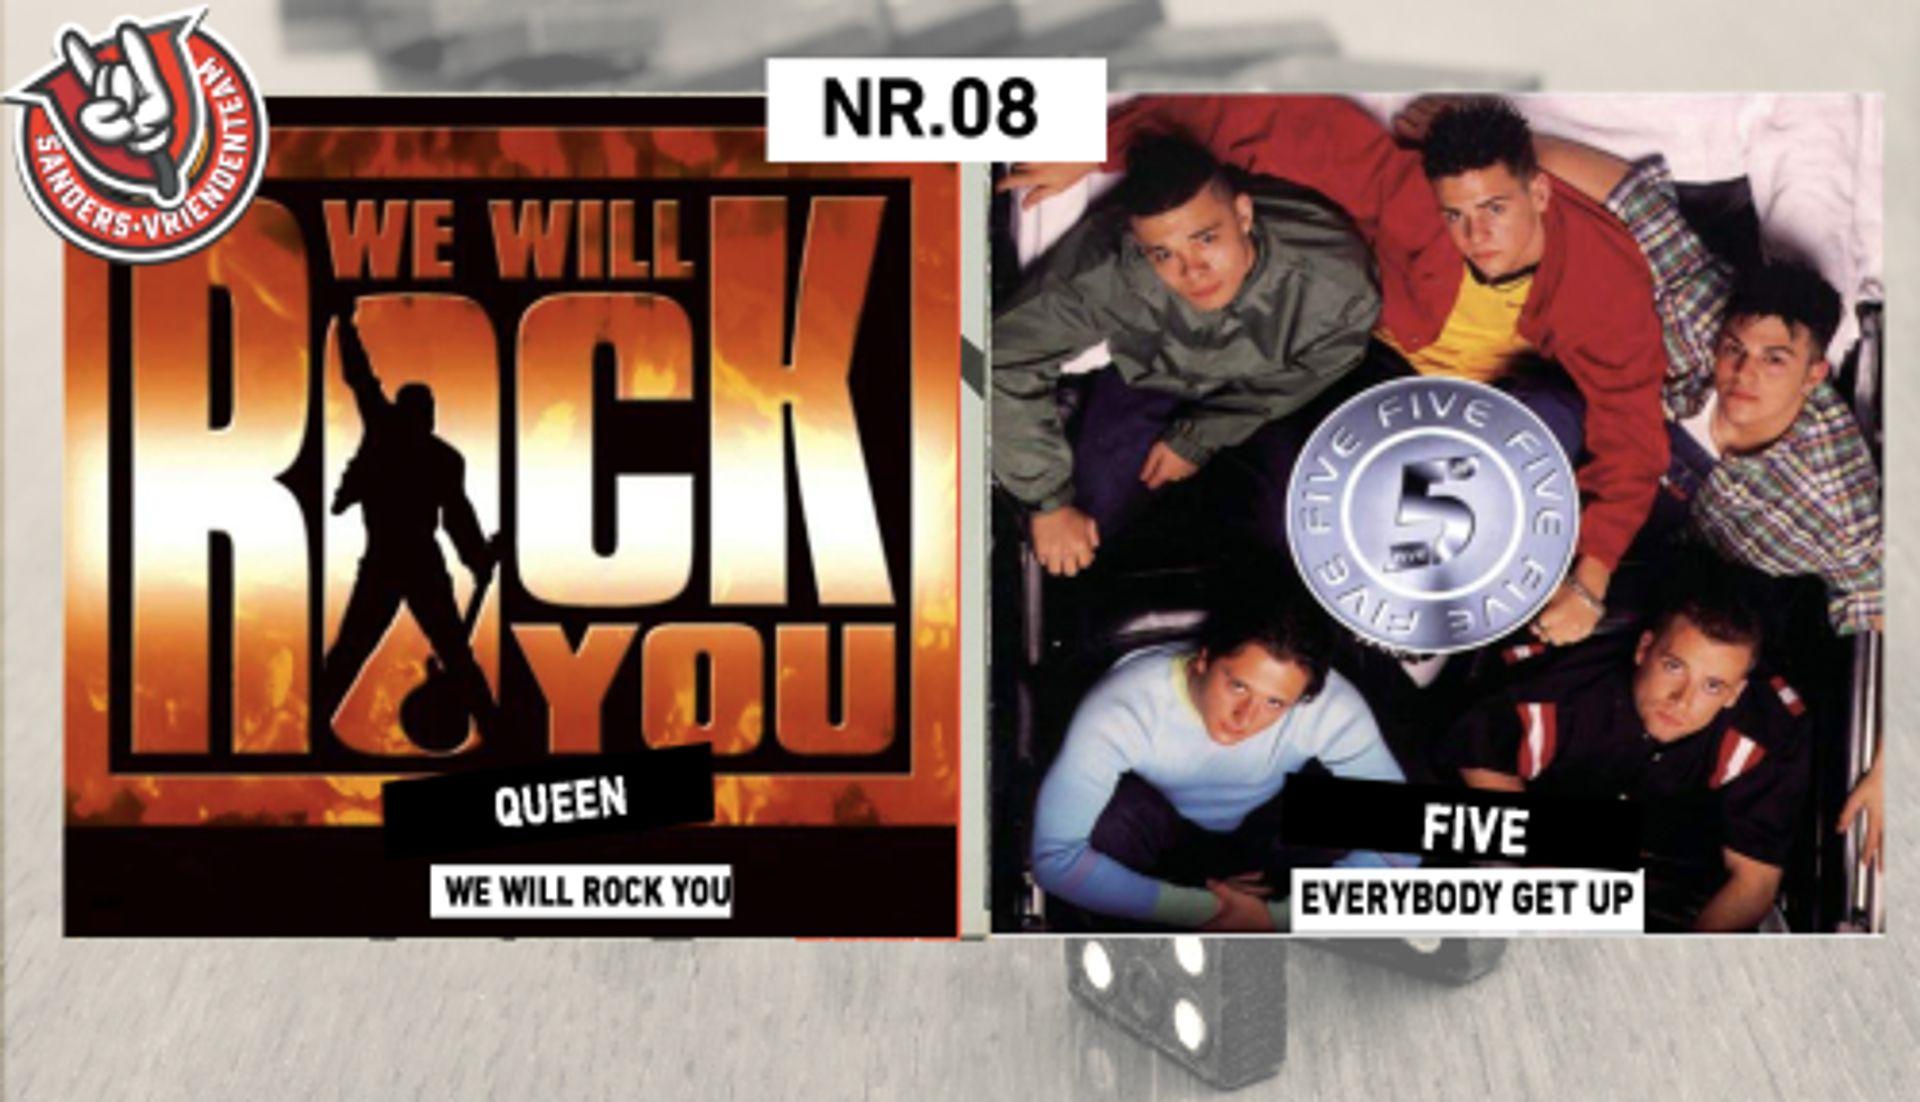 INTRODOMINO:QUEEN - WE WILL ROCK YOU & FIVE - EVERYBODY GET UP